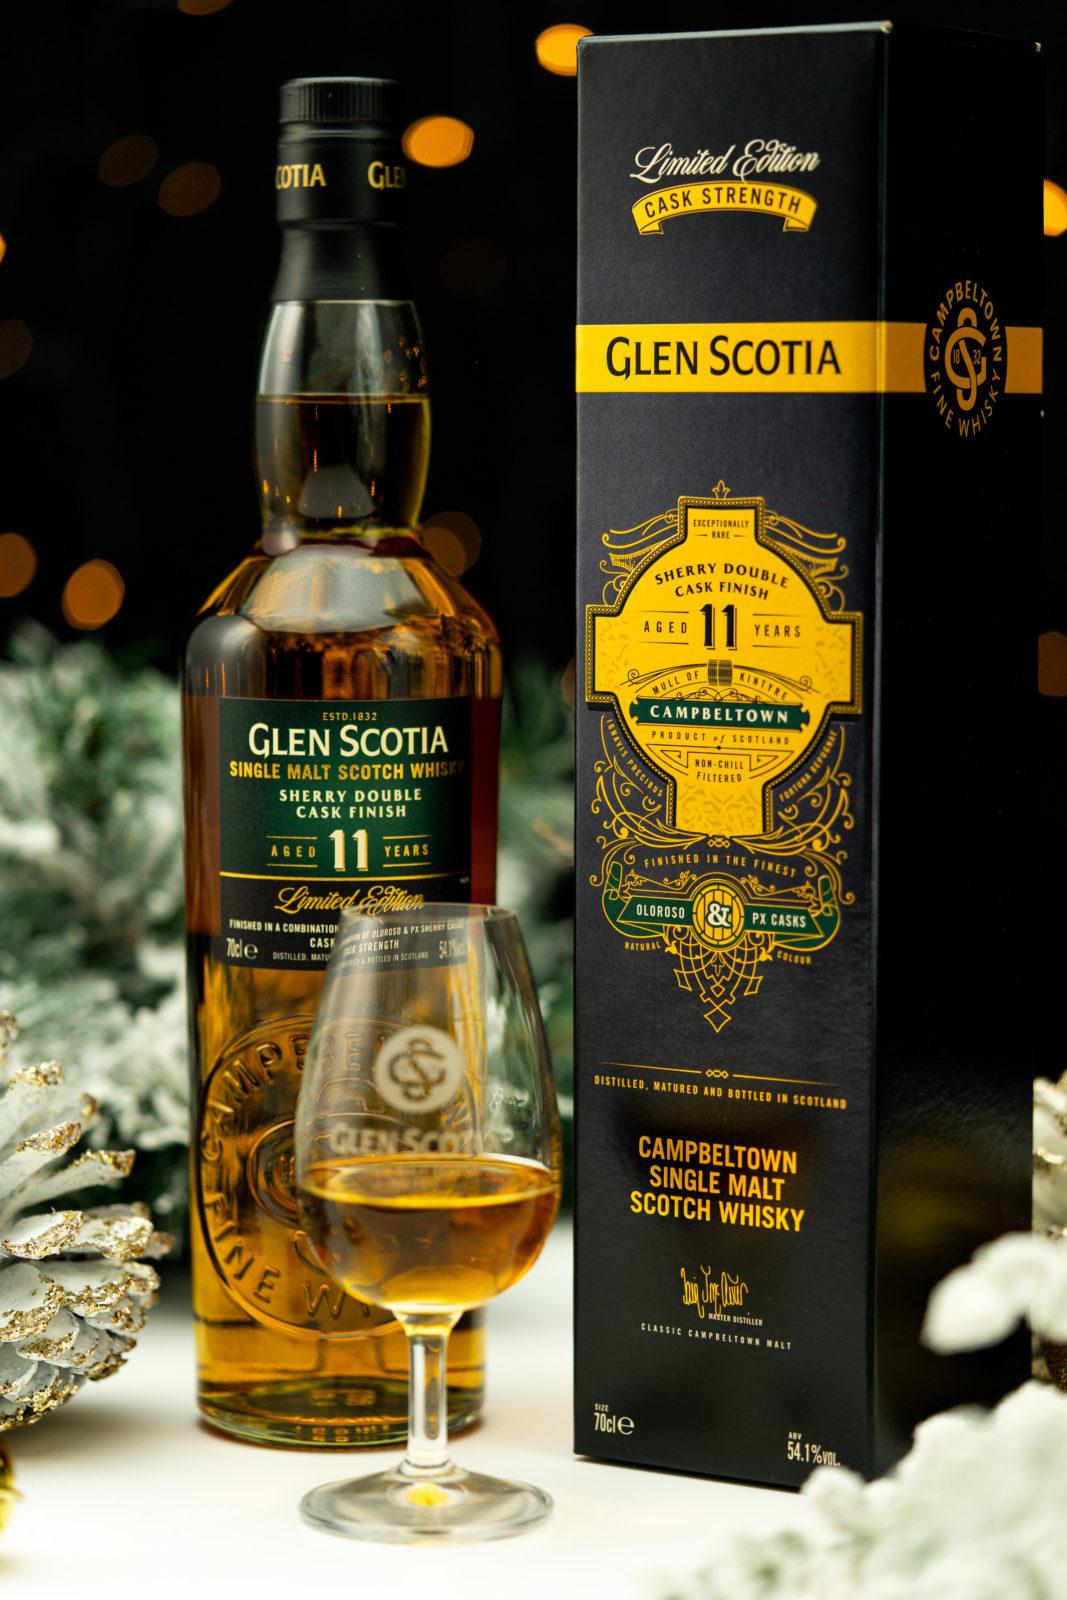 Glen Scotia Unveils New Sherry Cask Finish photo